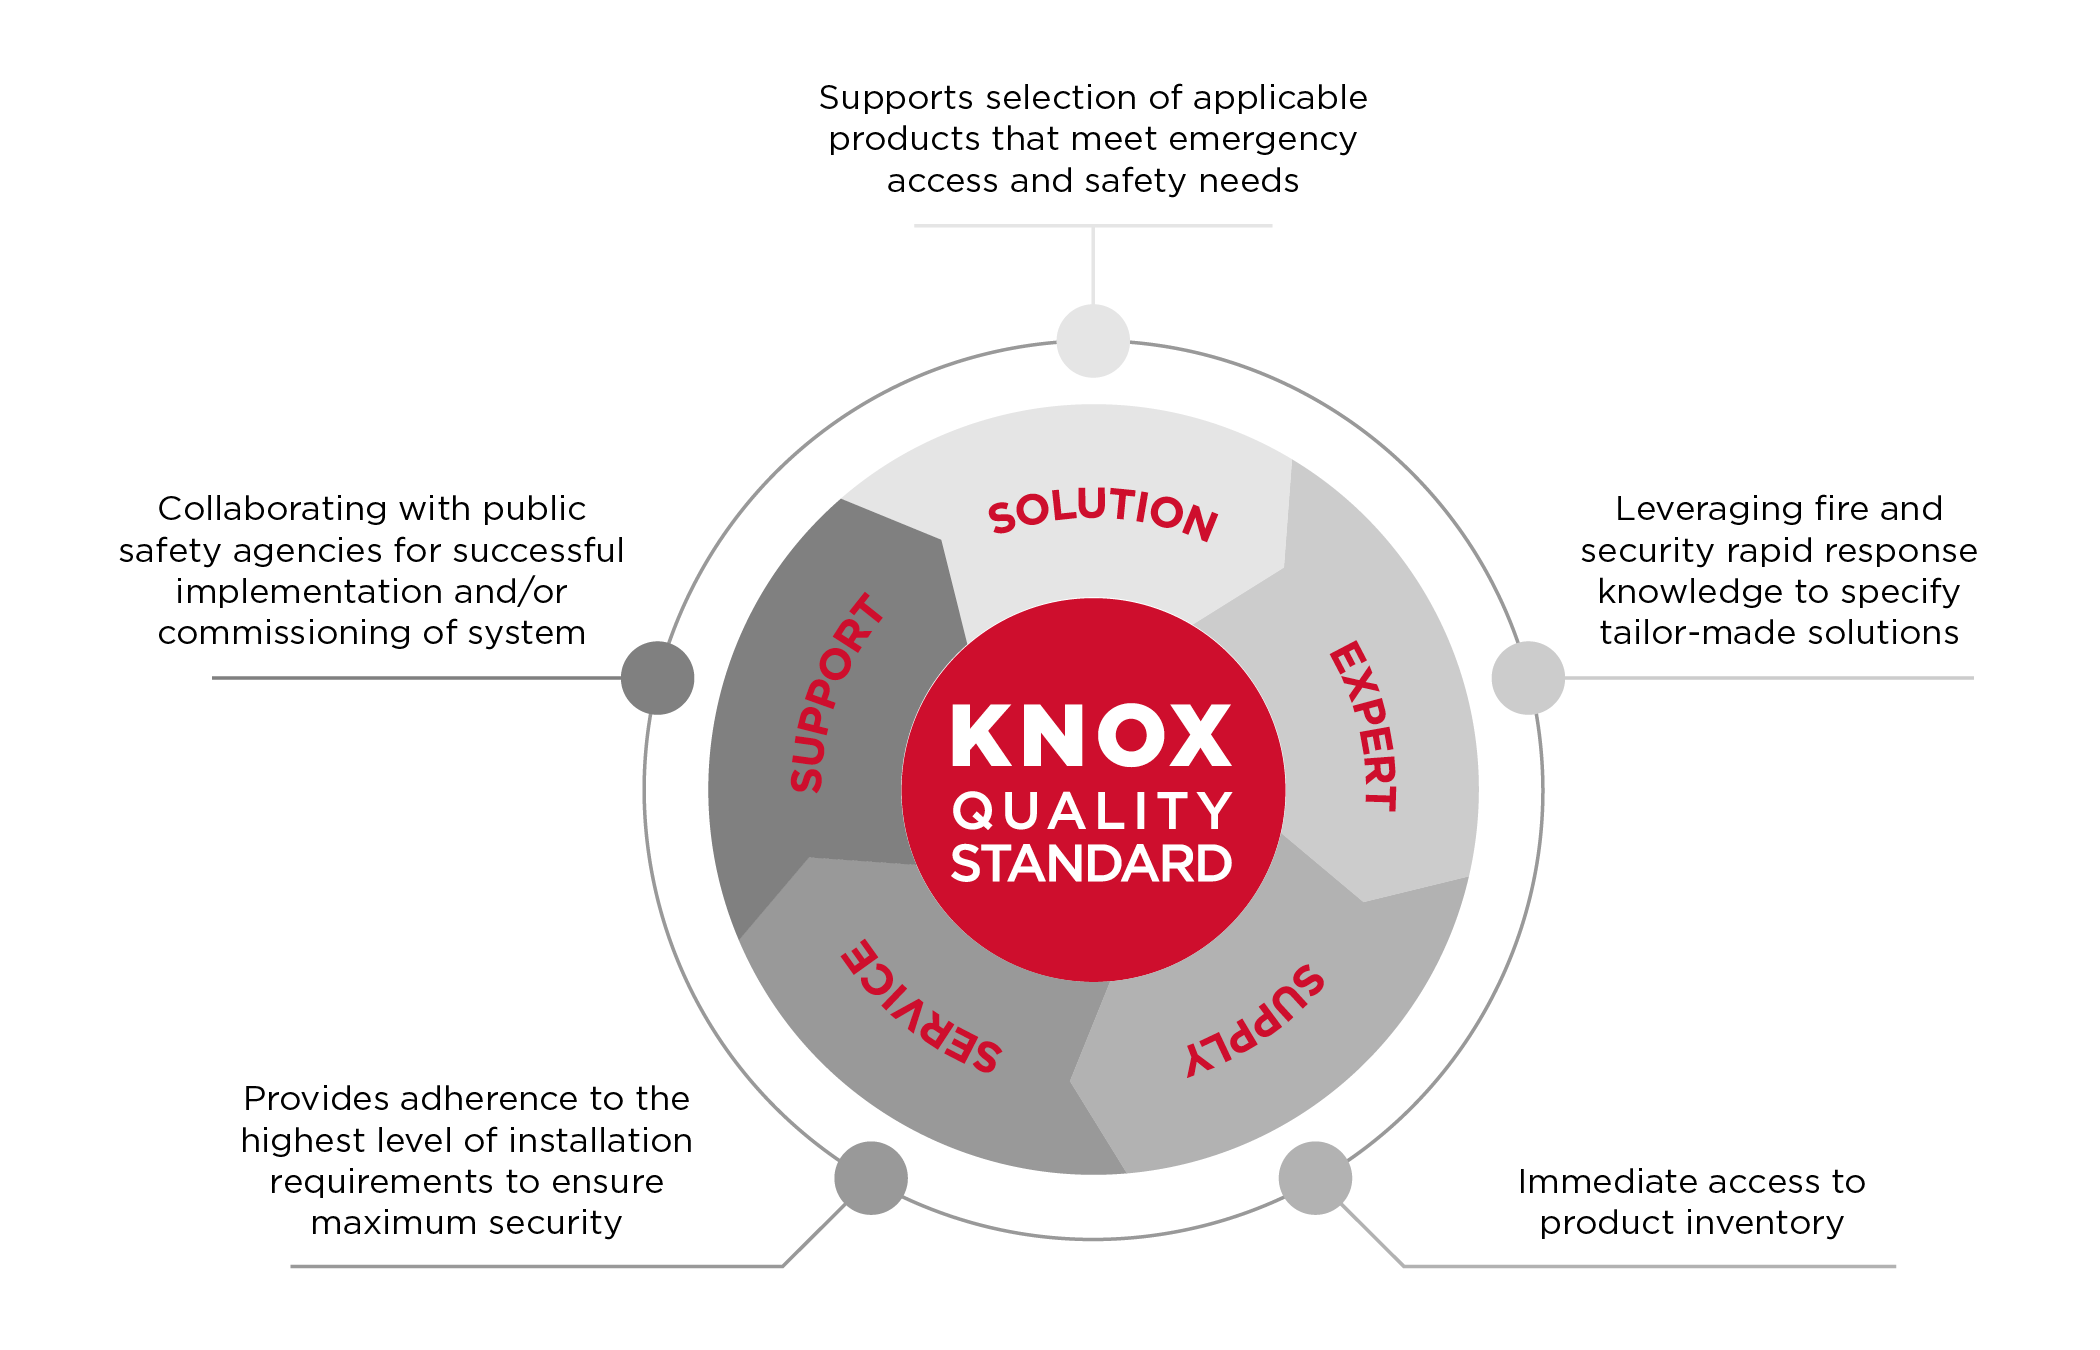 Knox Quality Standard